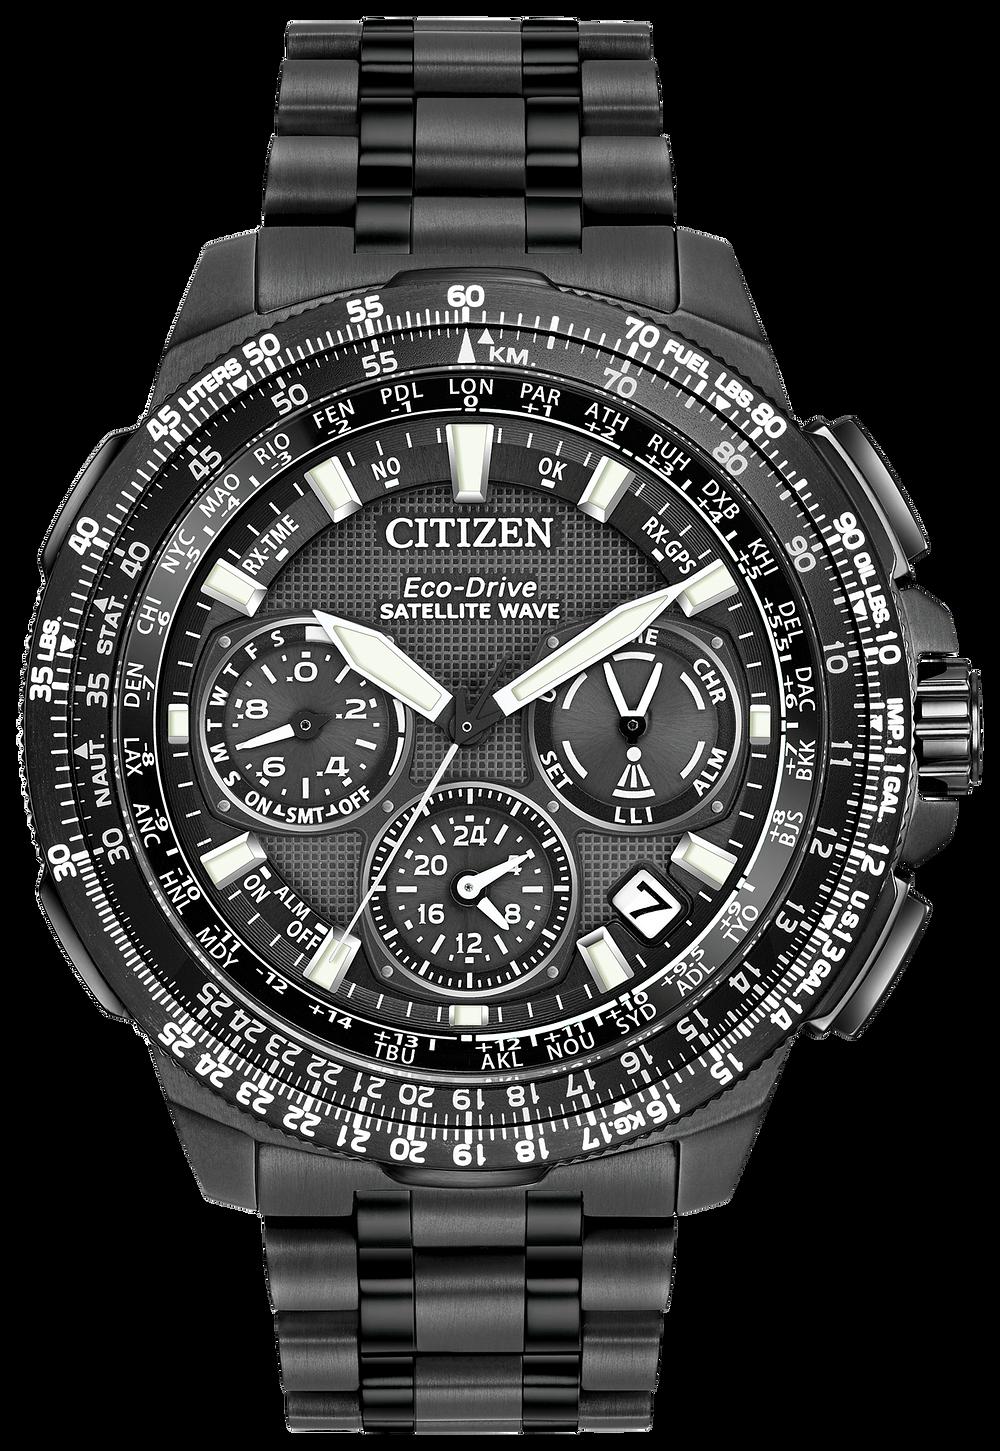 cf074cbf461 Satellite Wave F900 - Men s Eco-Drive Black Titanium Watch